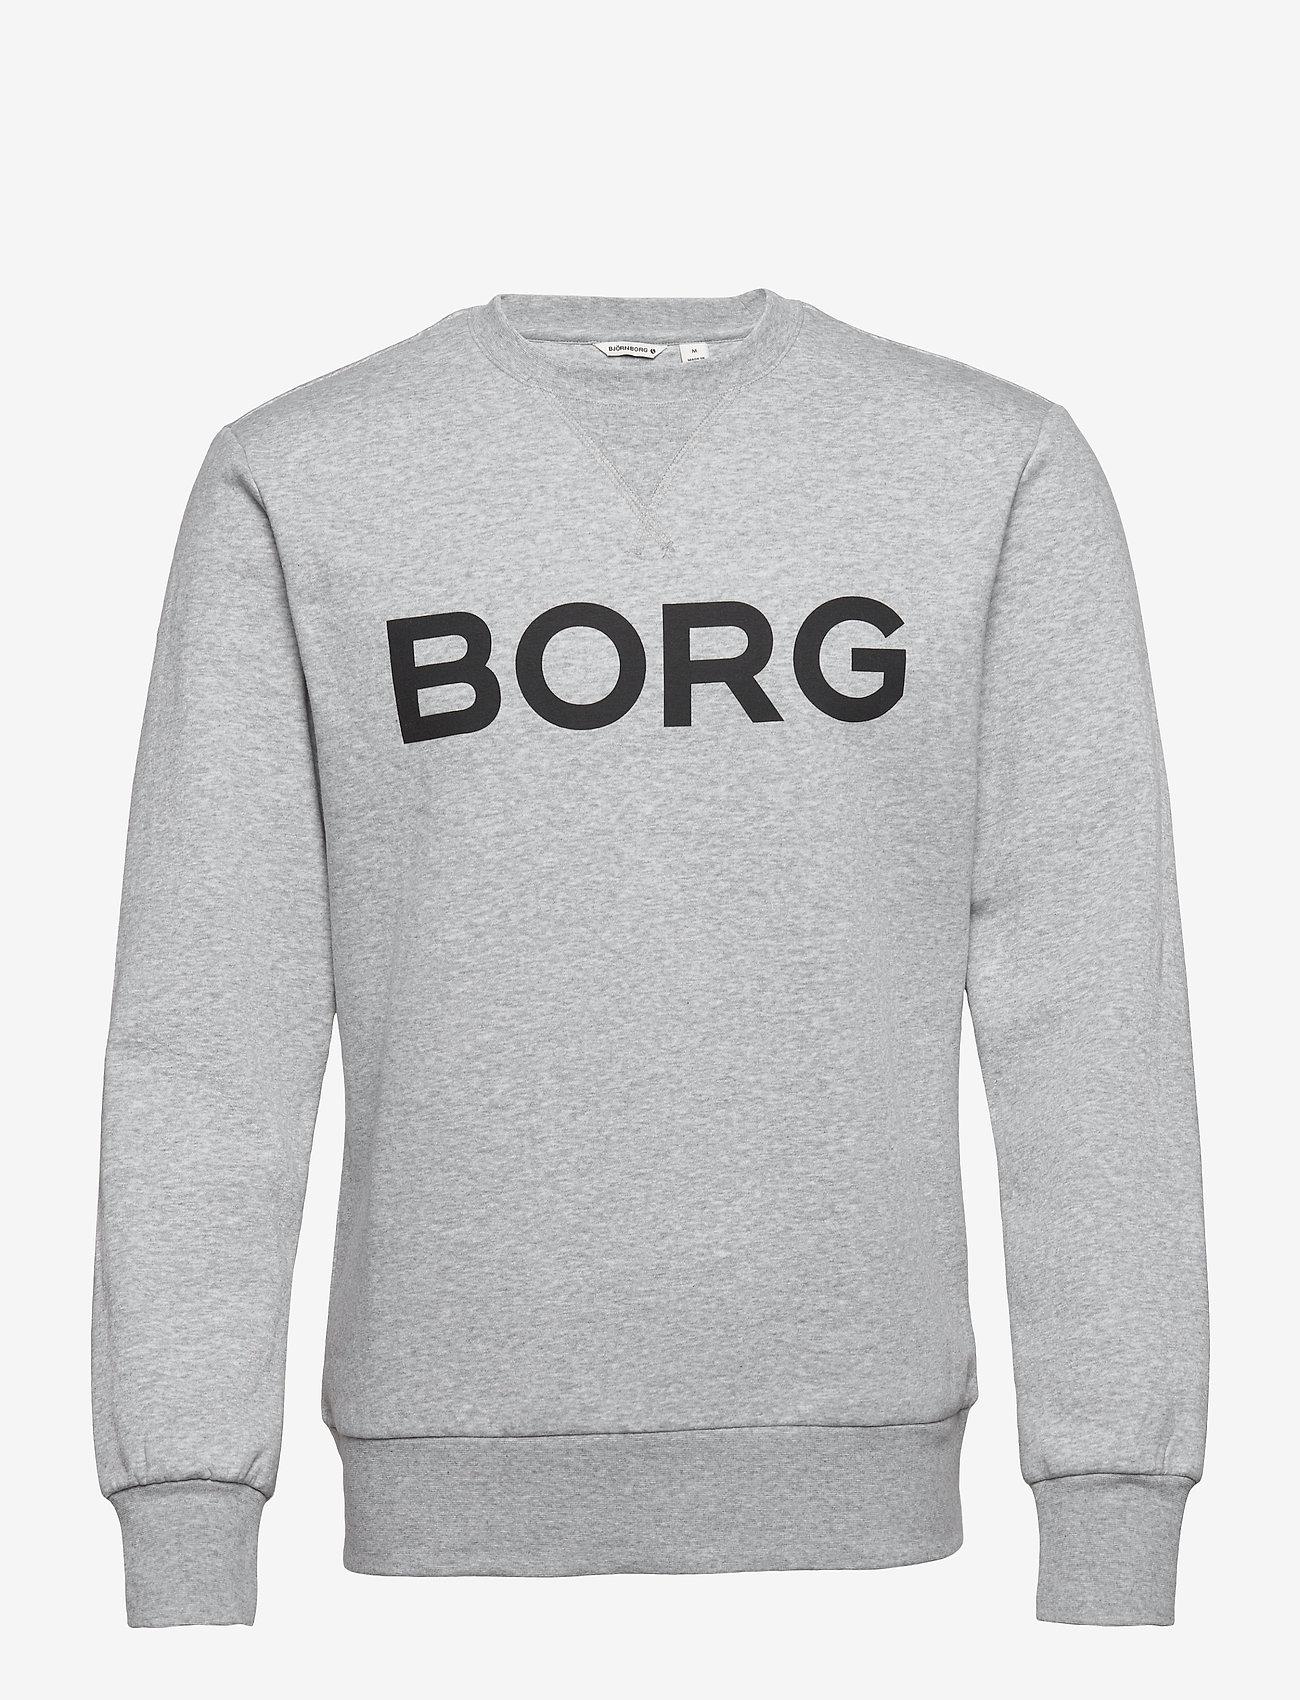 Björn Borg - CREW M BB LOGO M BB LOGO - basic sweatshirts - h108by light grey melange - 1